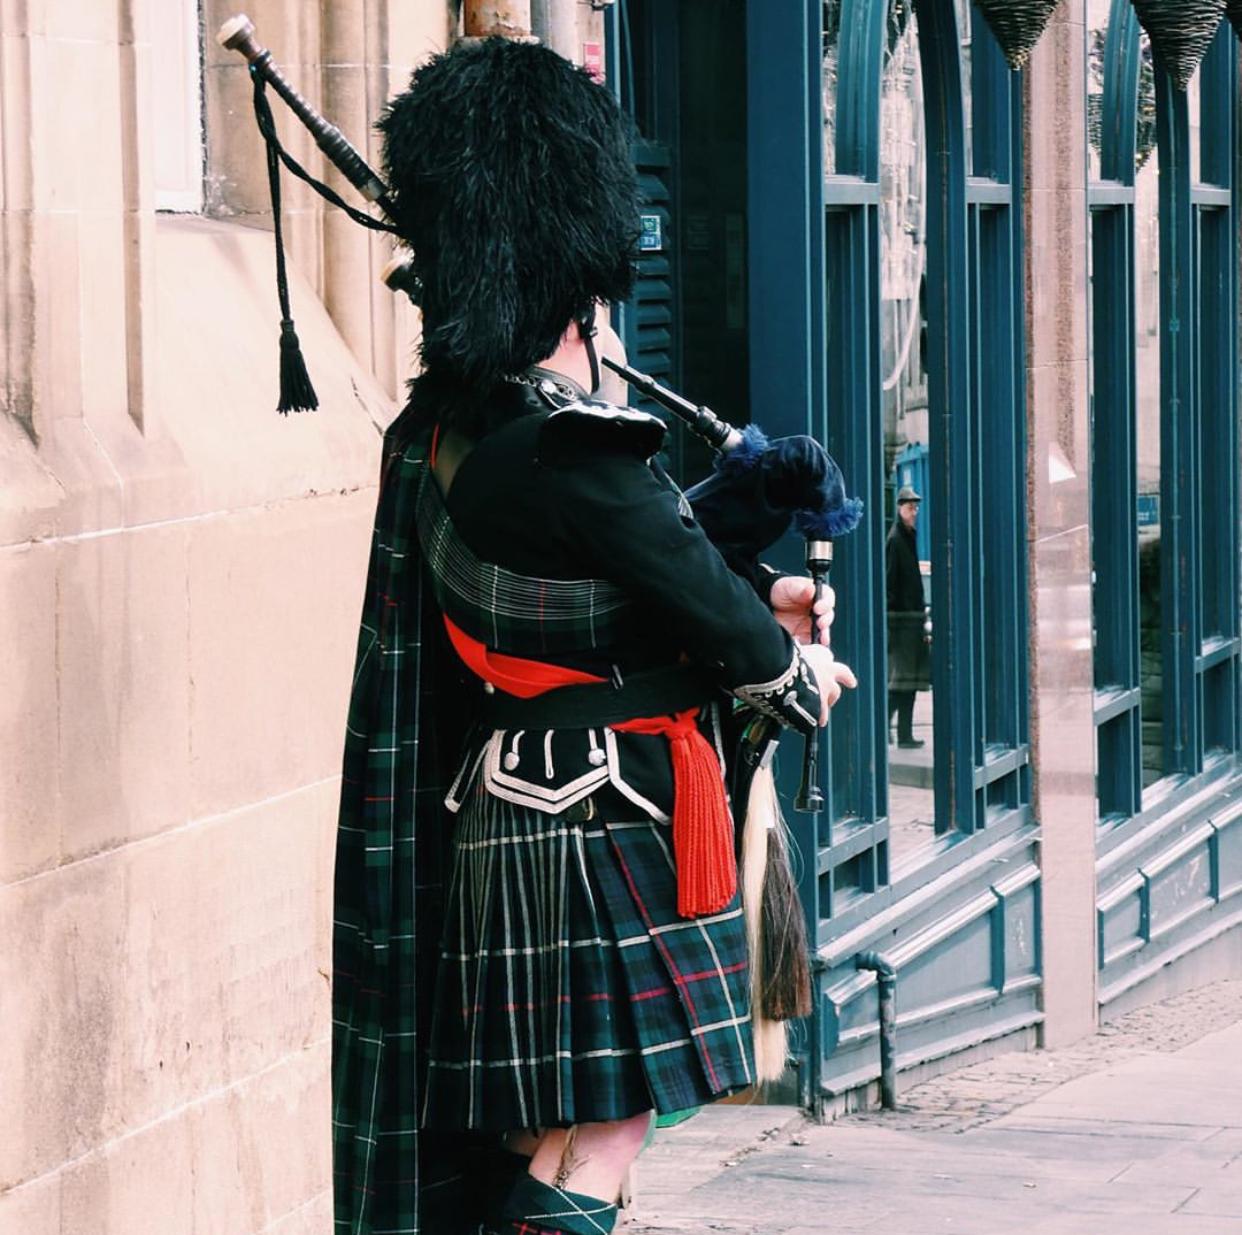 Gaitero tocando la gaita en la Ciudad Vieja de Edimburgo